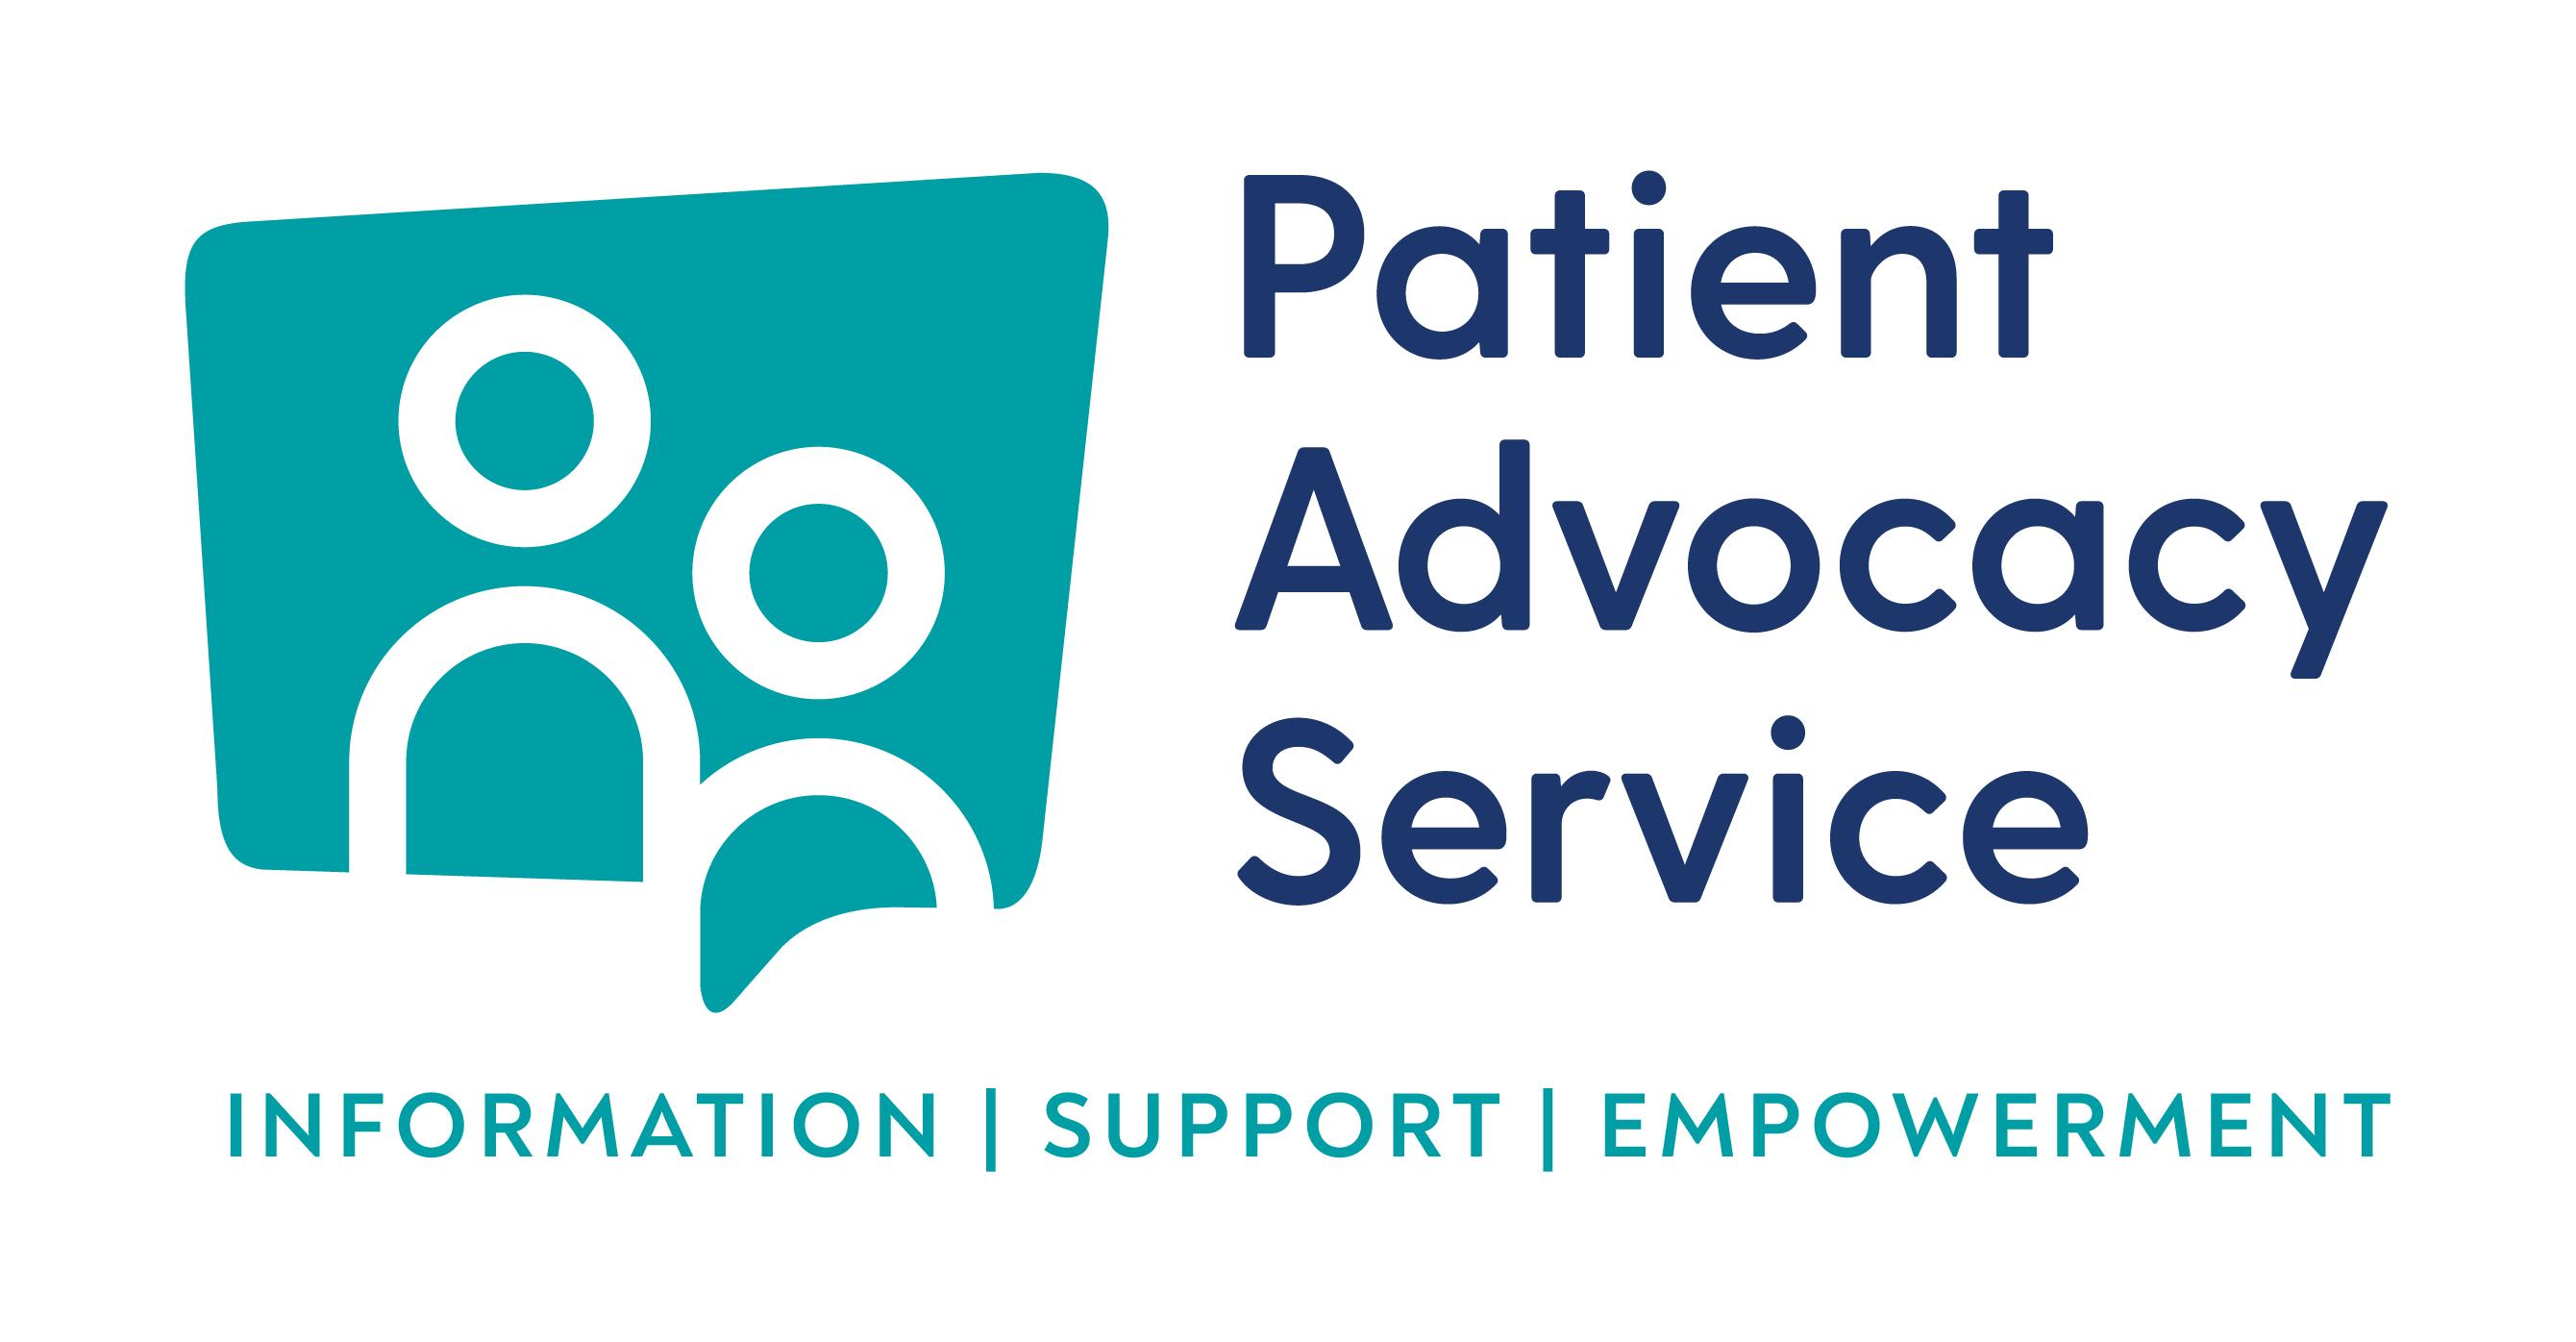 National Advocacy Service